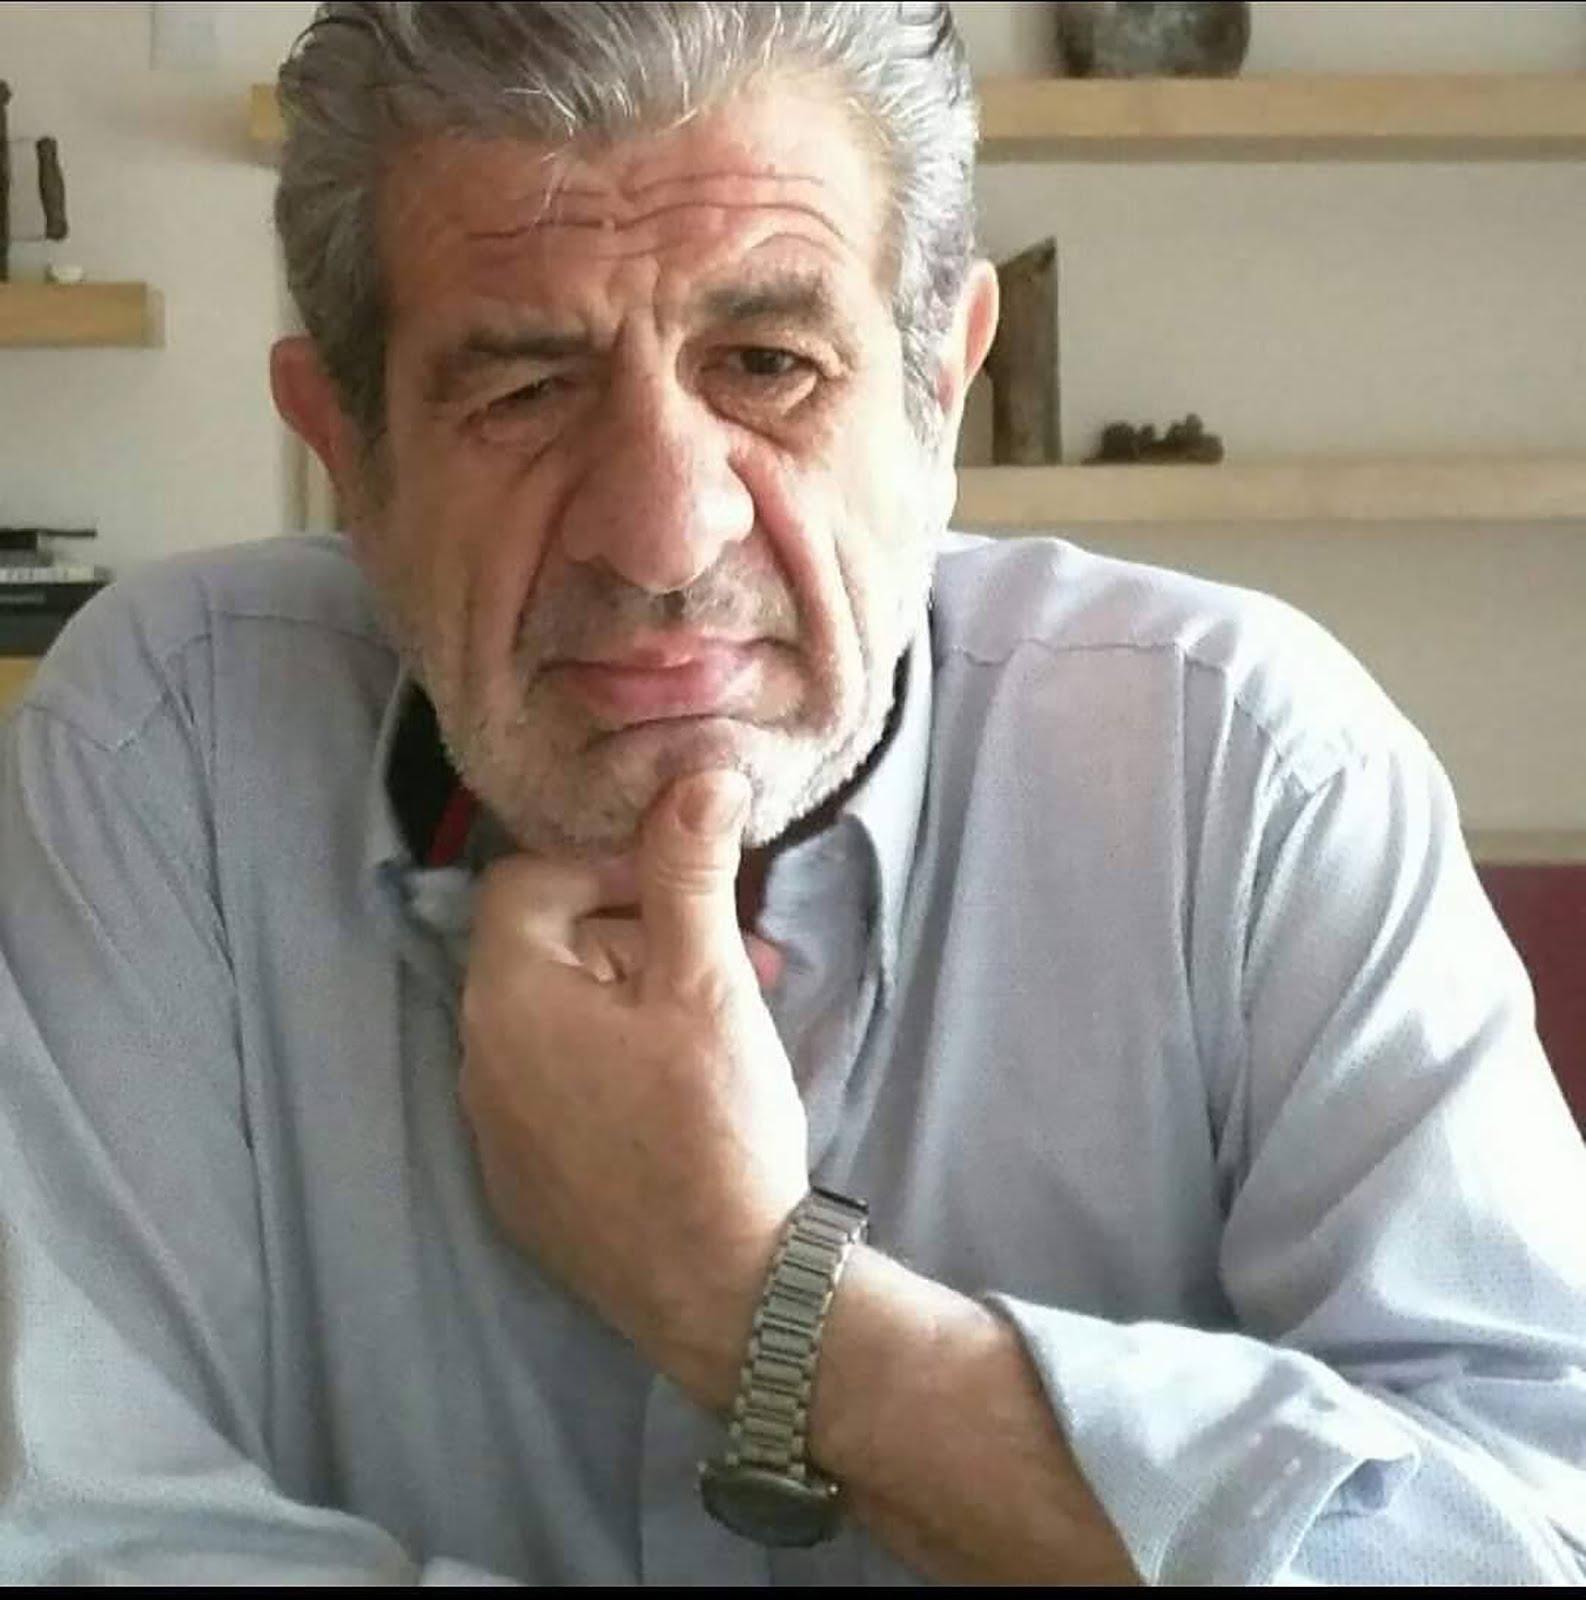 José Palladino